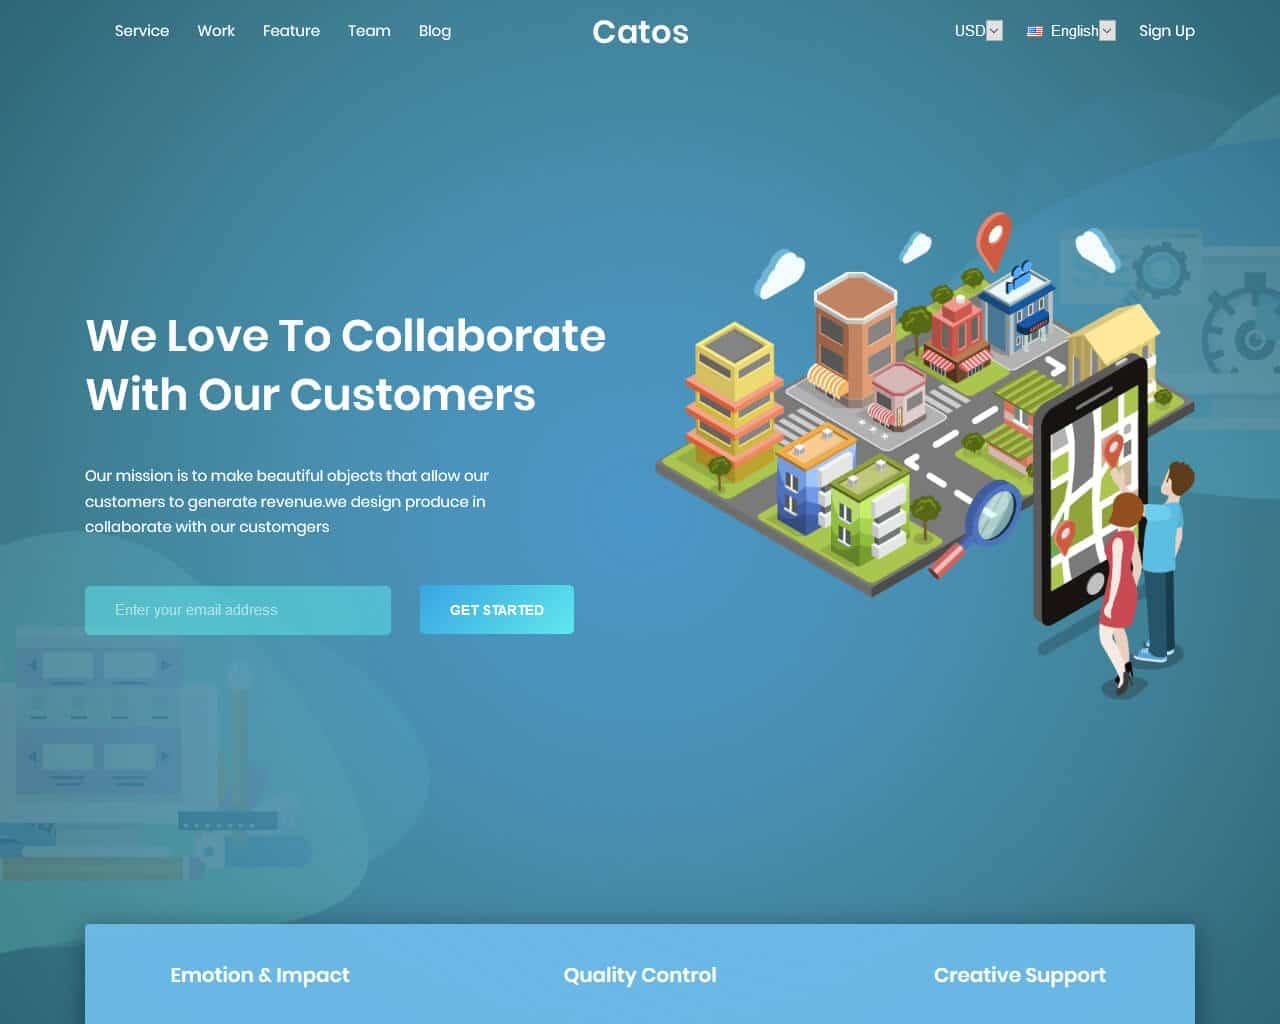 Catos Website Template